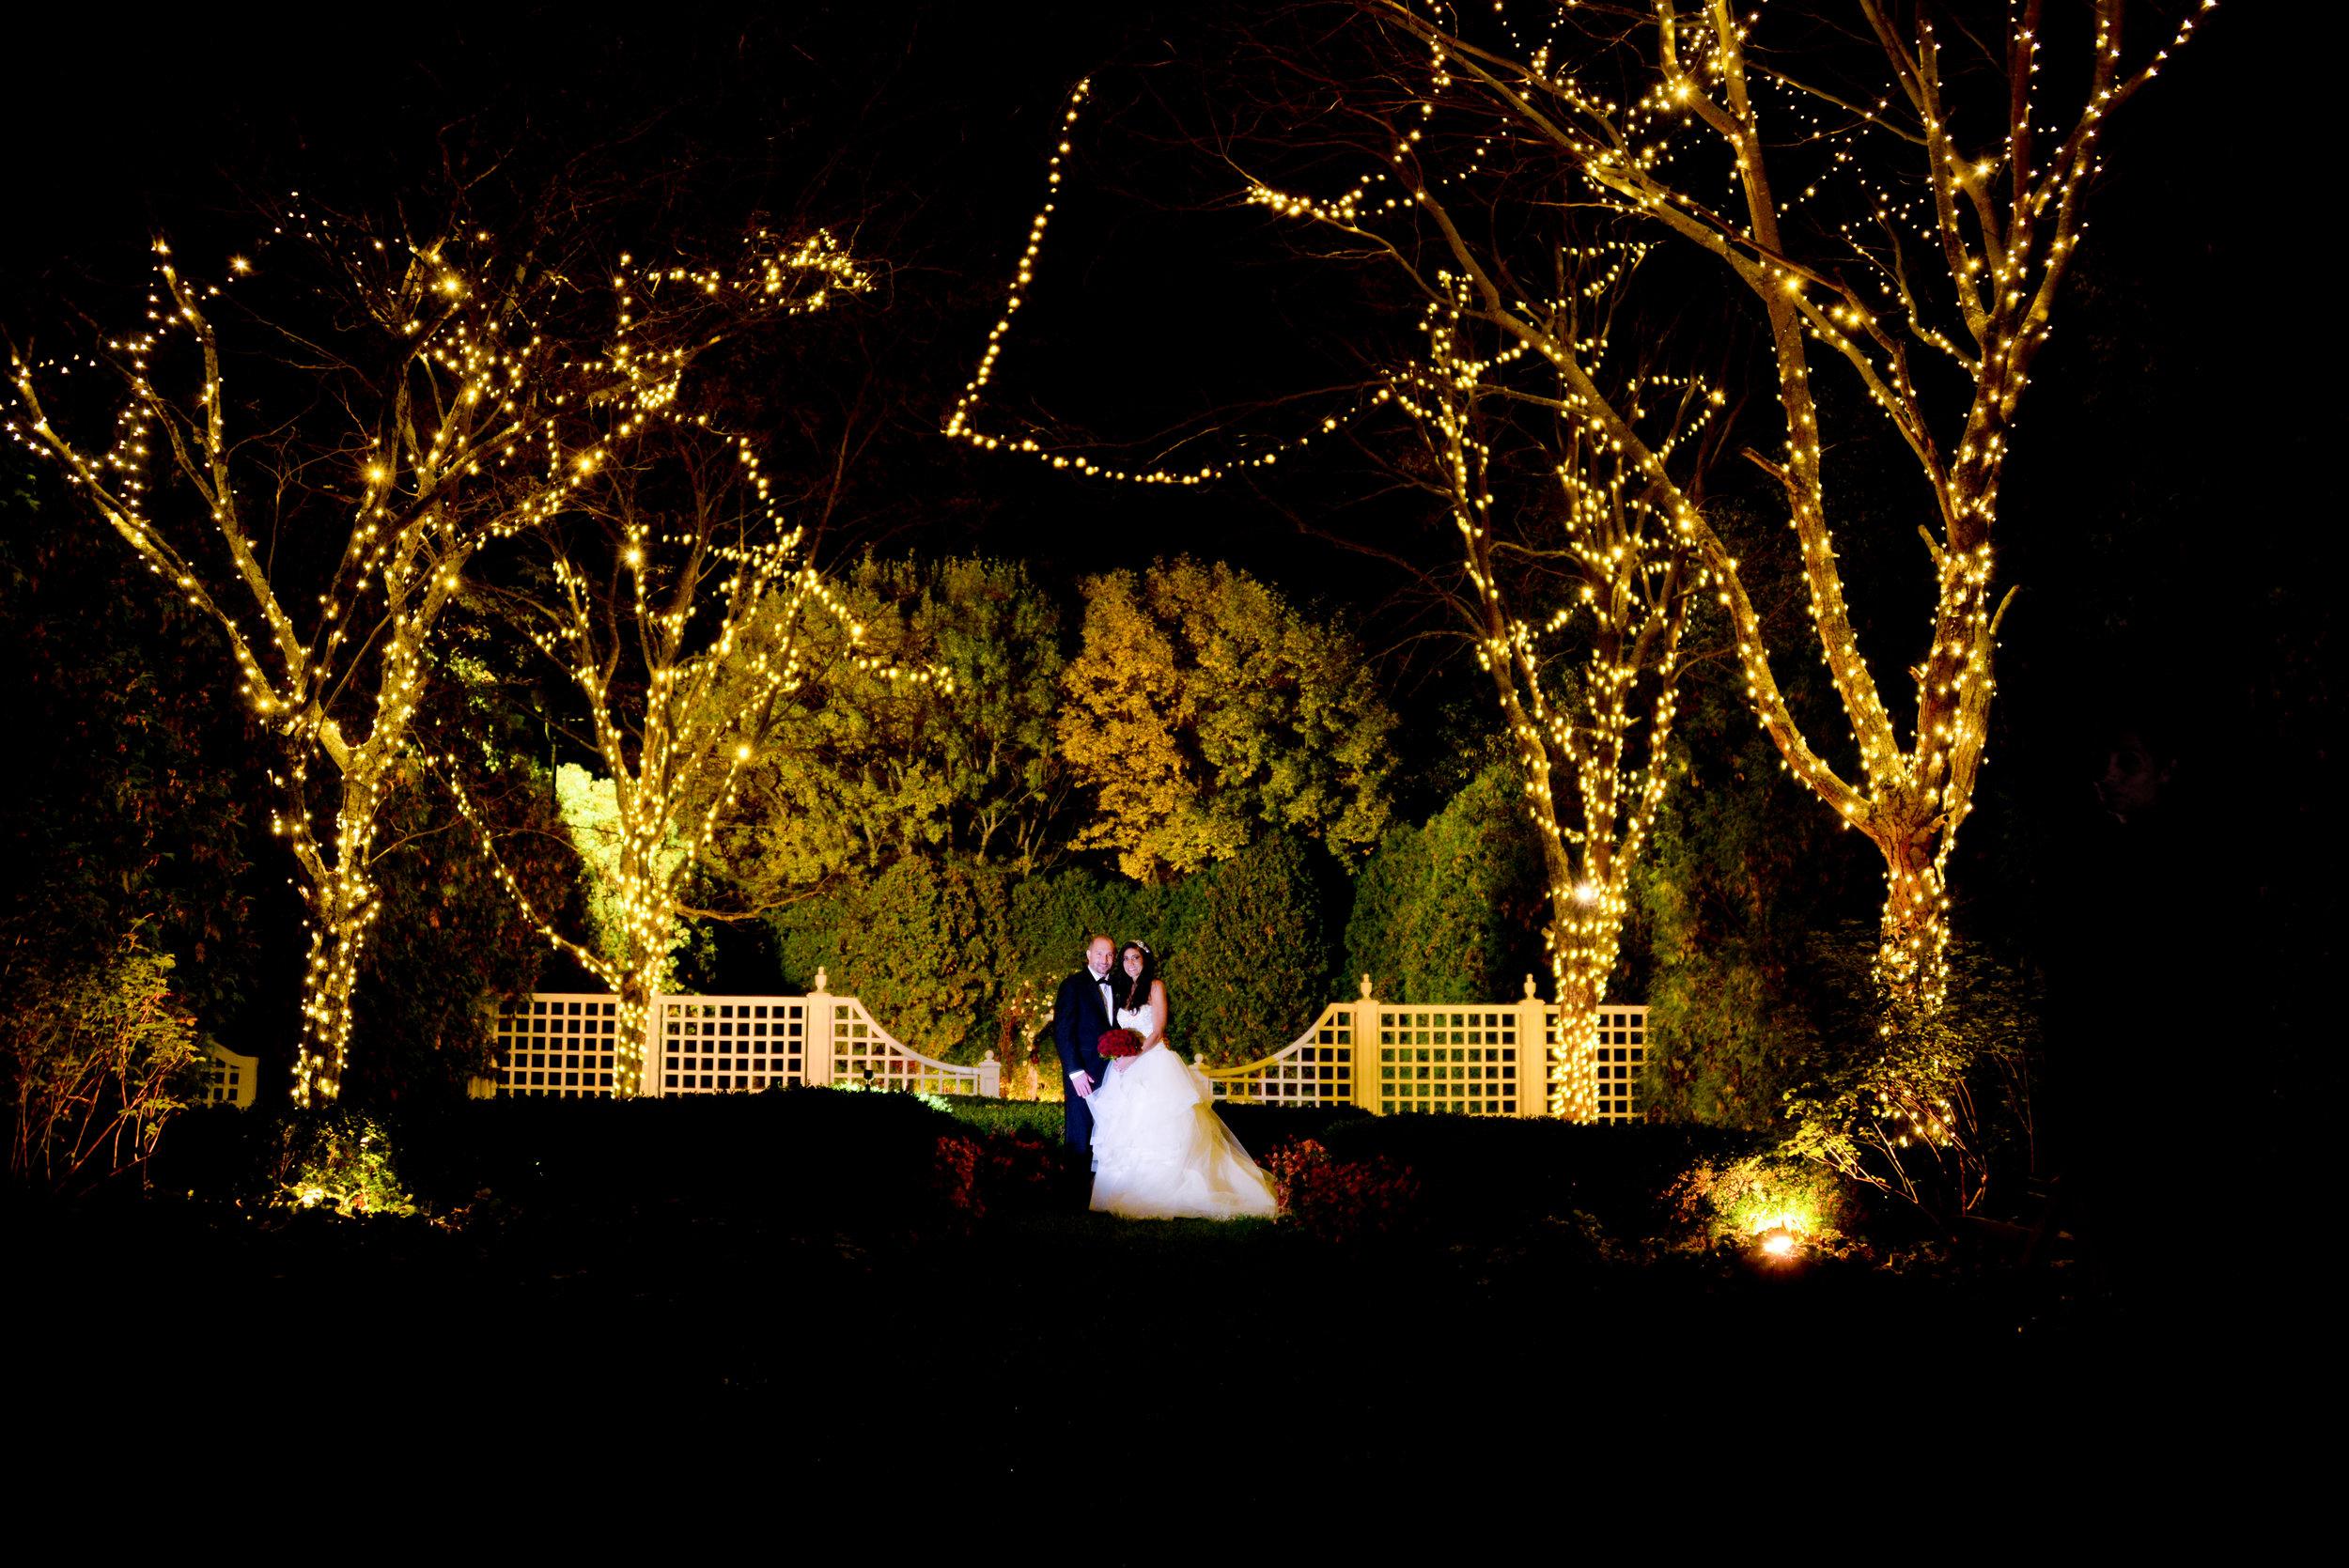 7-Reception-Ed & Theresa10.15.2016-NIC-OLE Photography-199.jpg